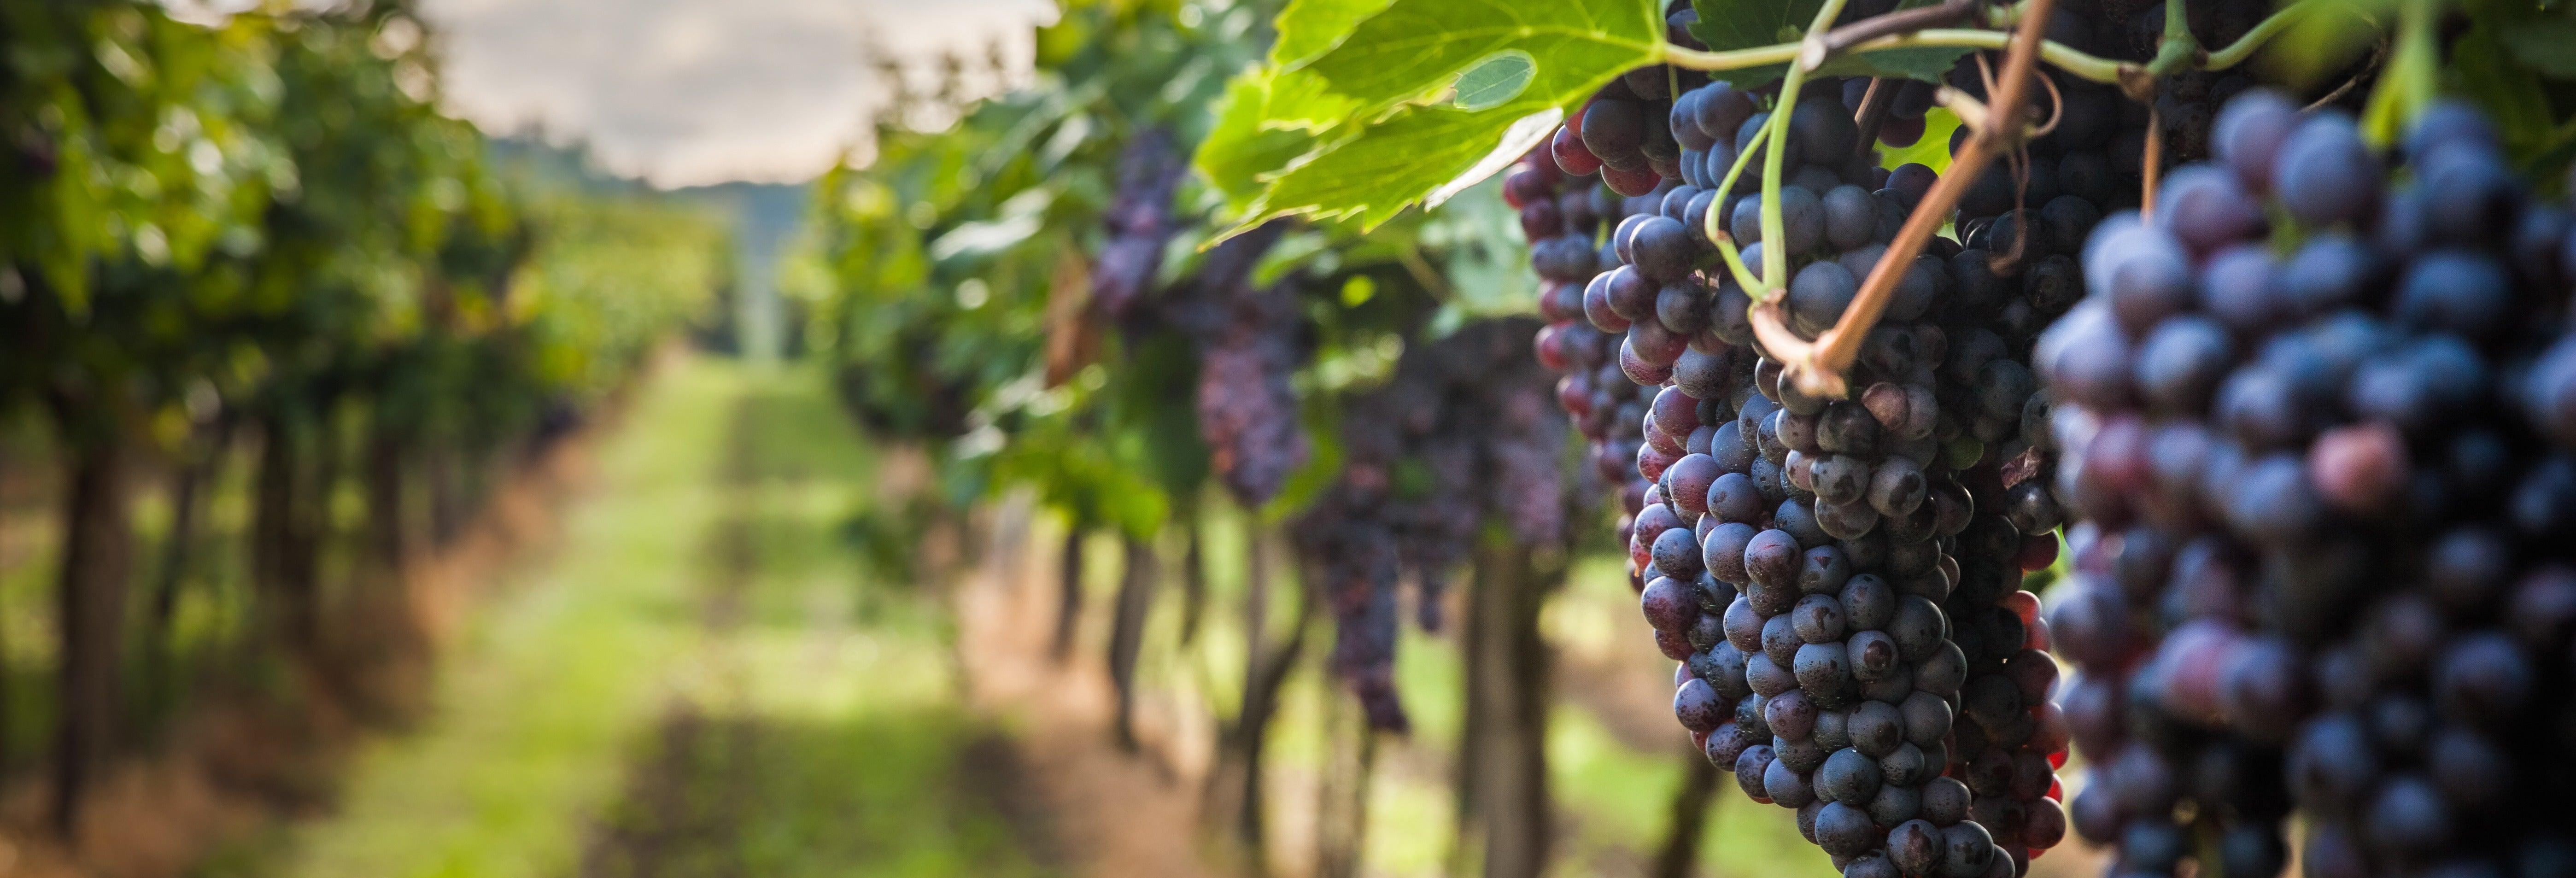 Visita a la viña Cousiño Macul